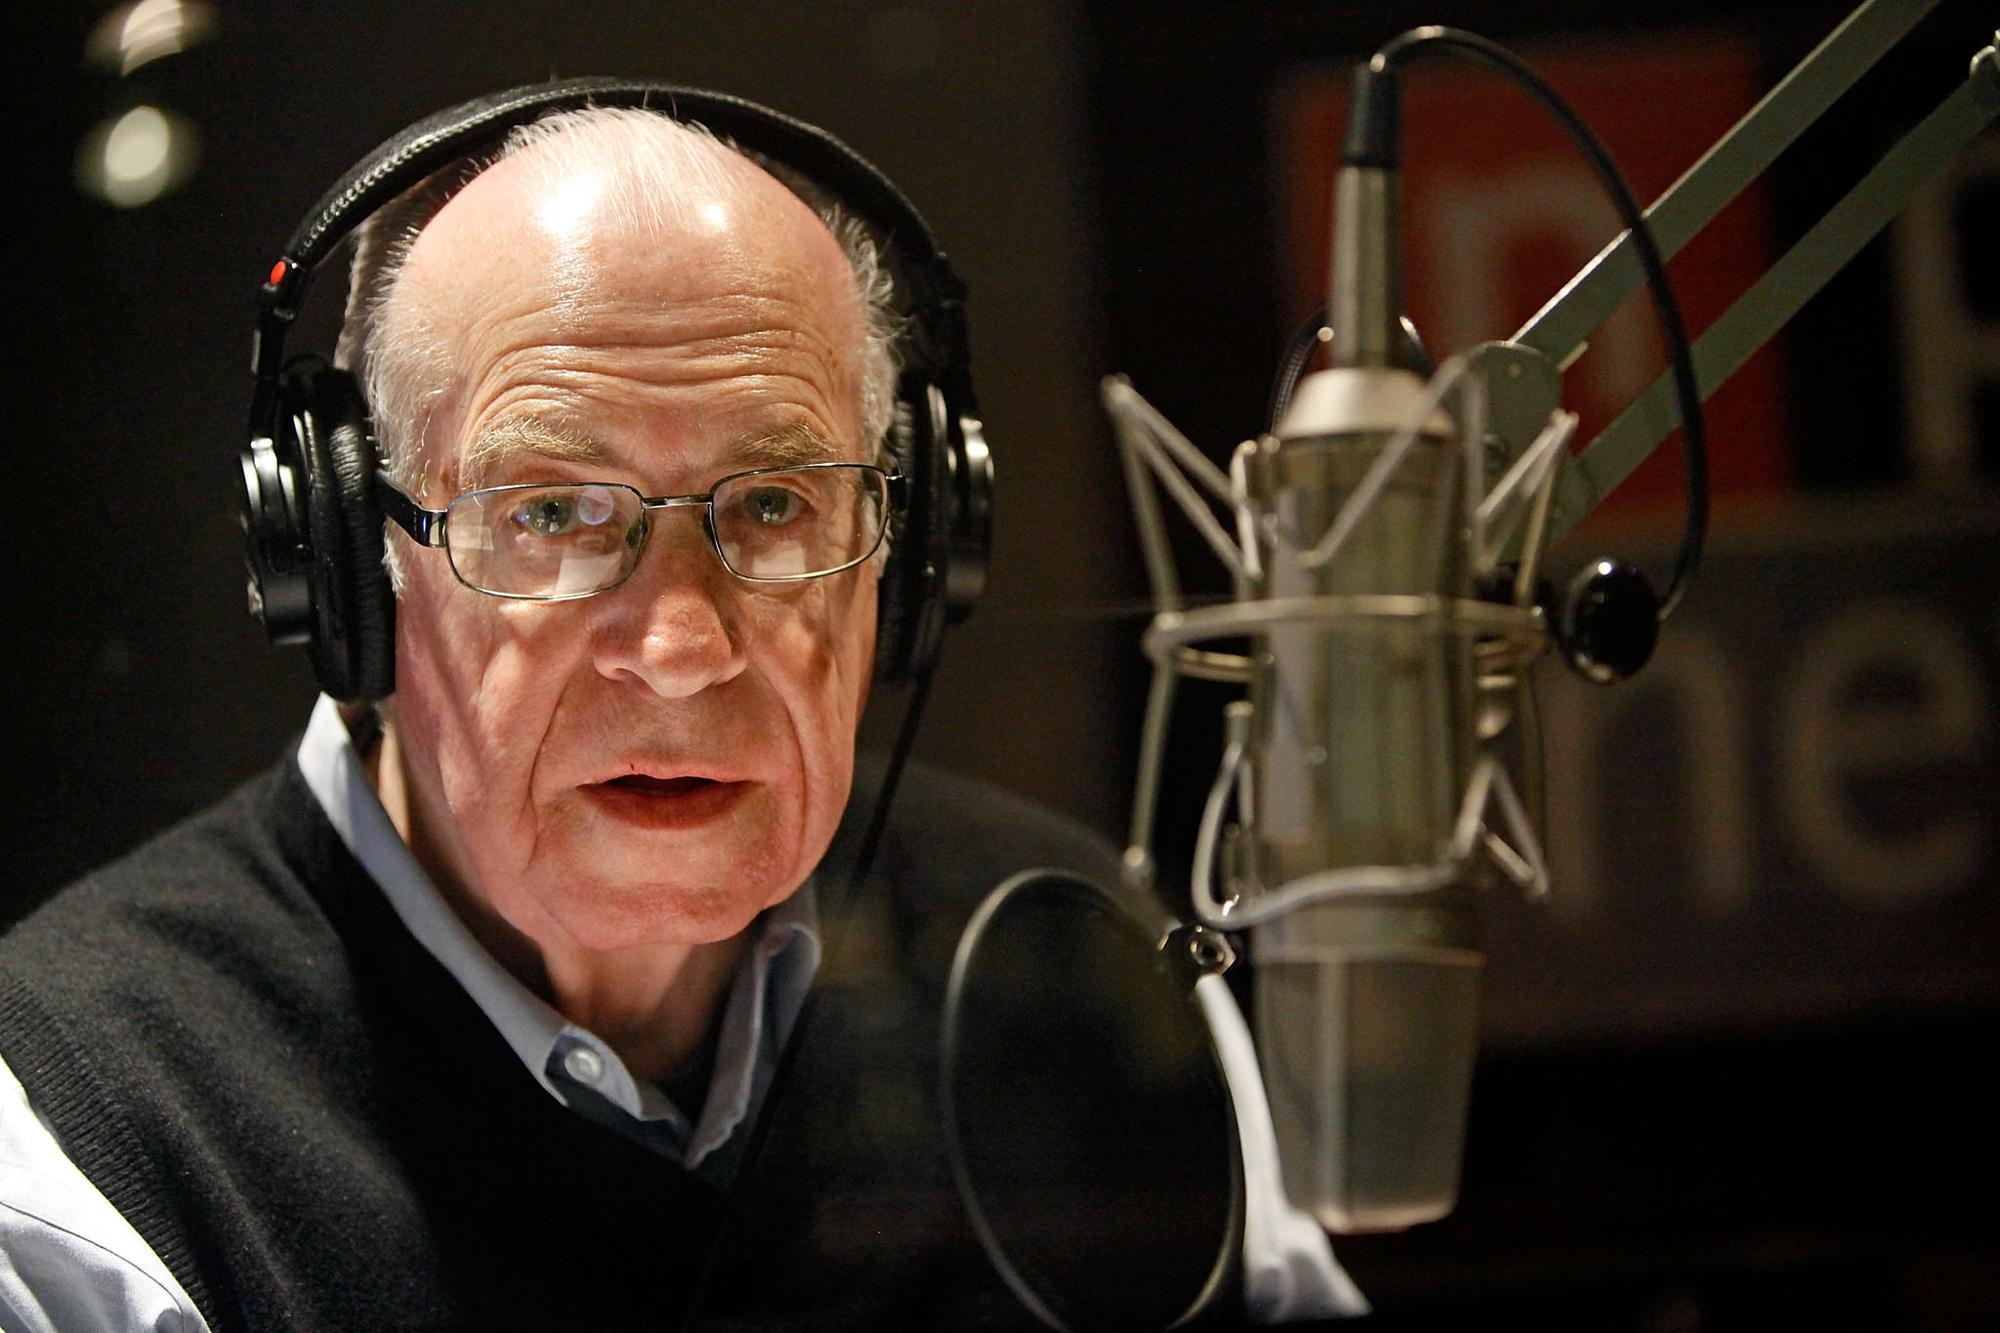 Carl Kasell on NPR